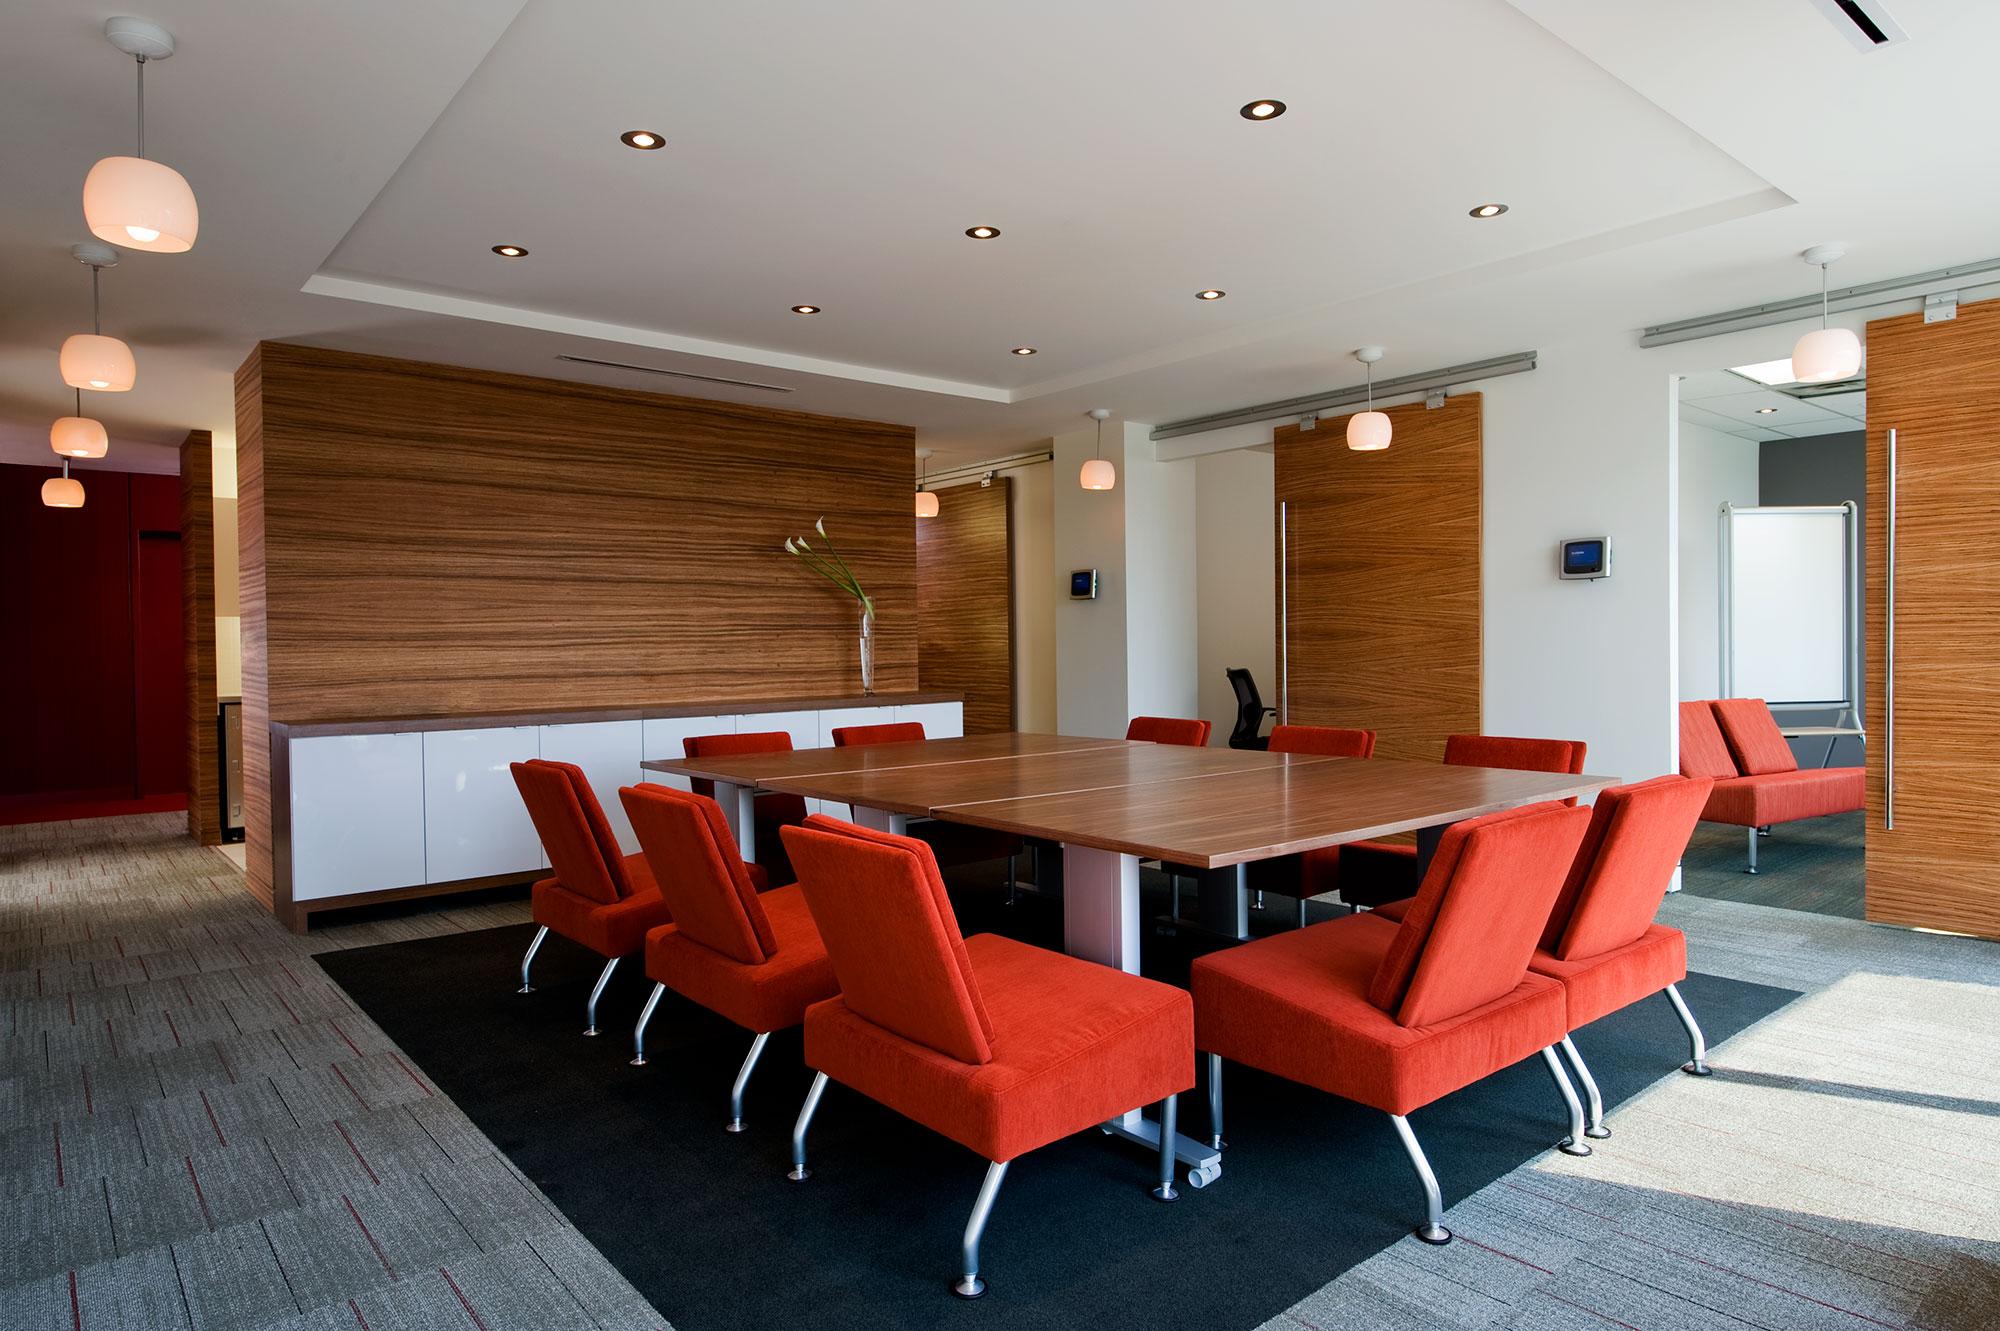 interior-design-media-office-boardroom-red-chairs.jpg